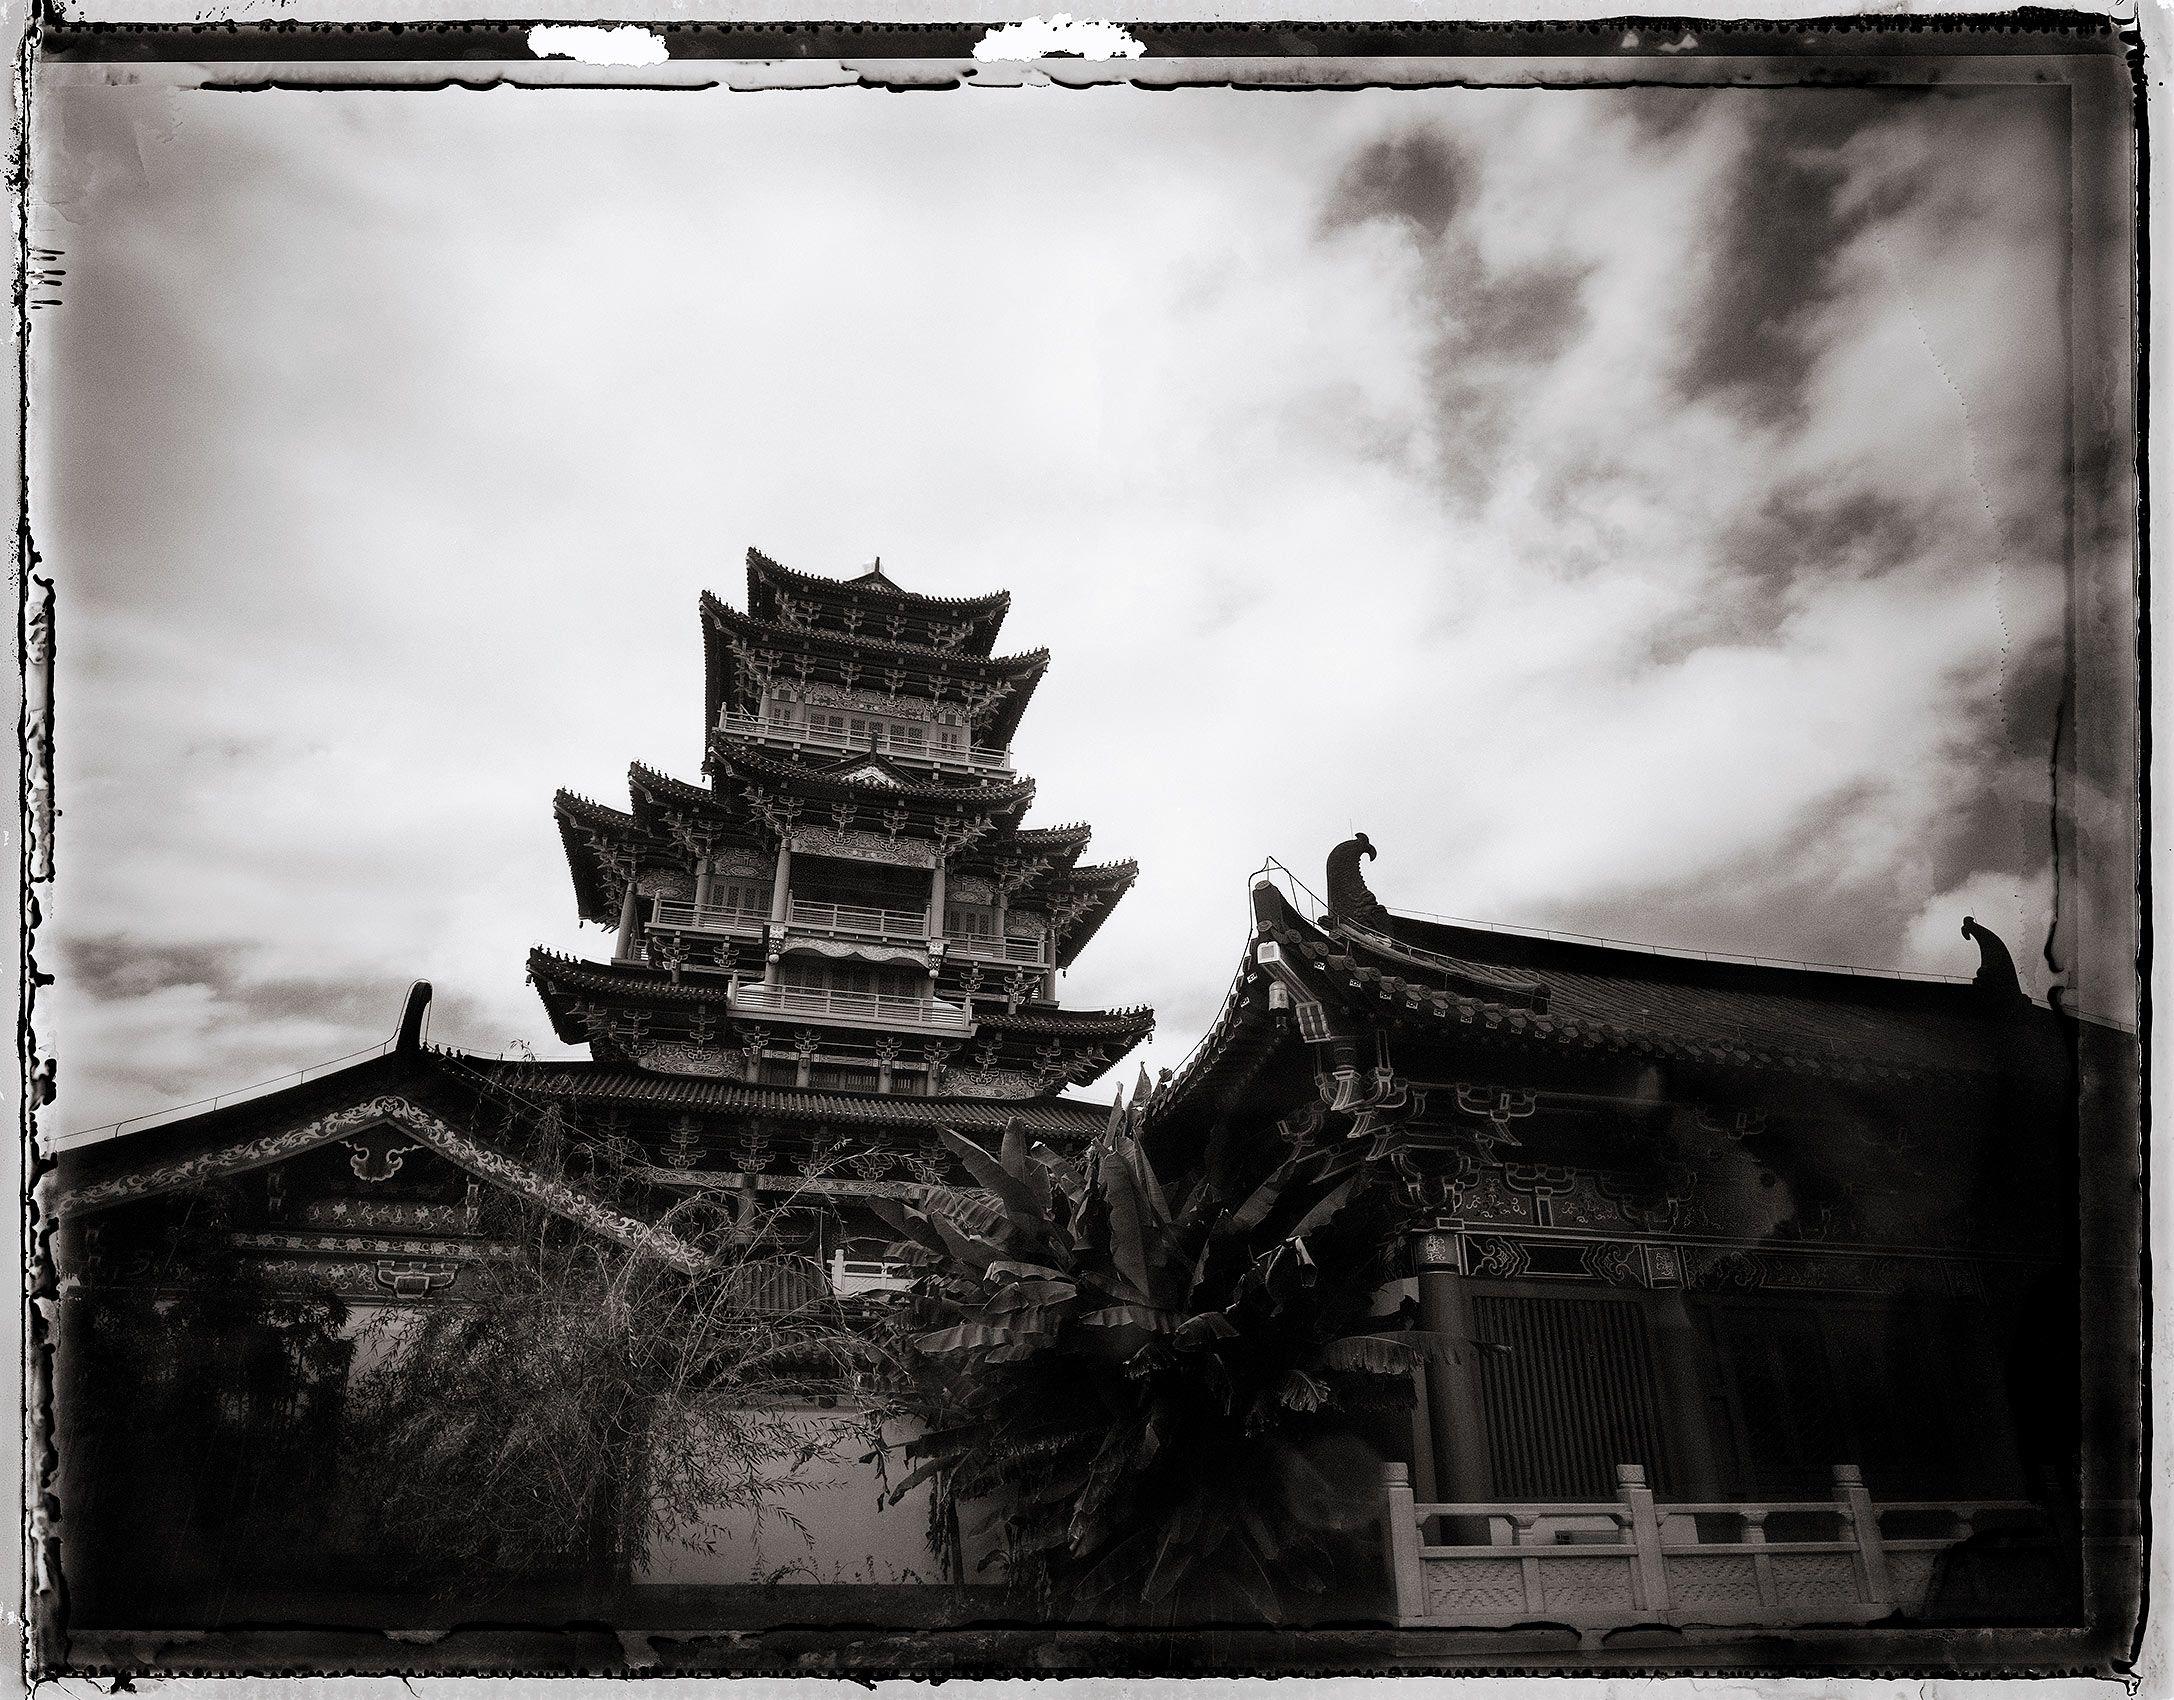 Lishui Pagoda